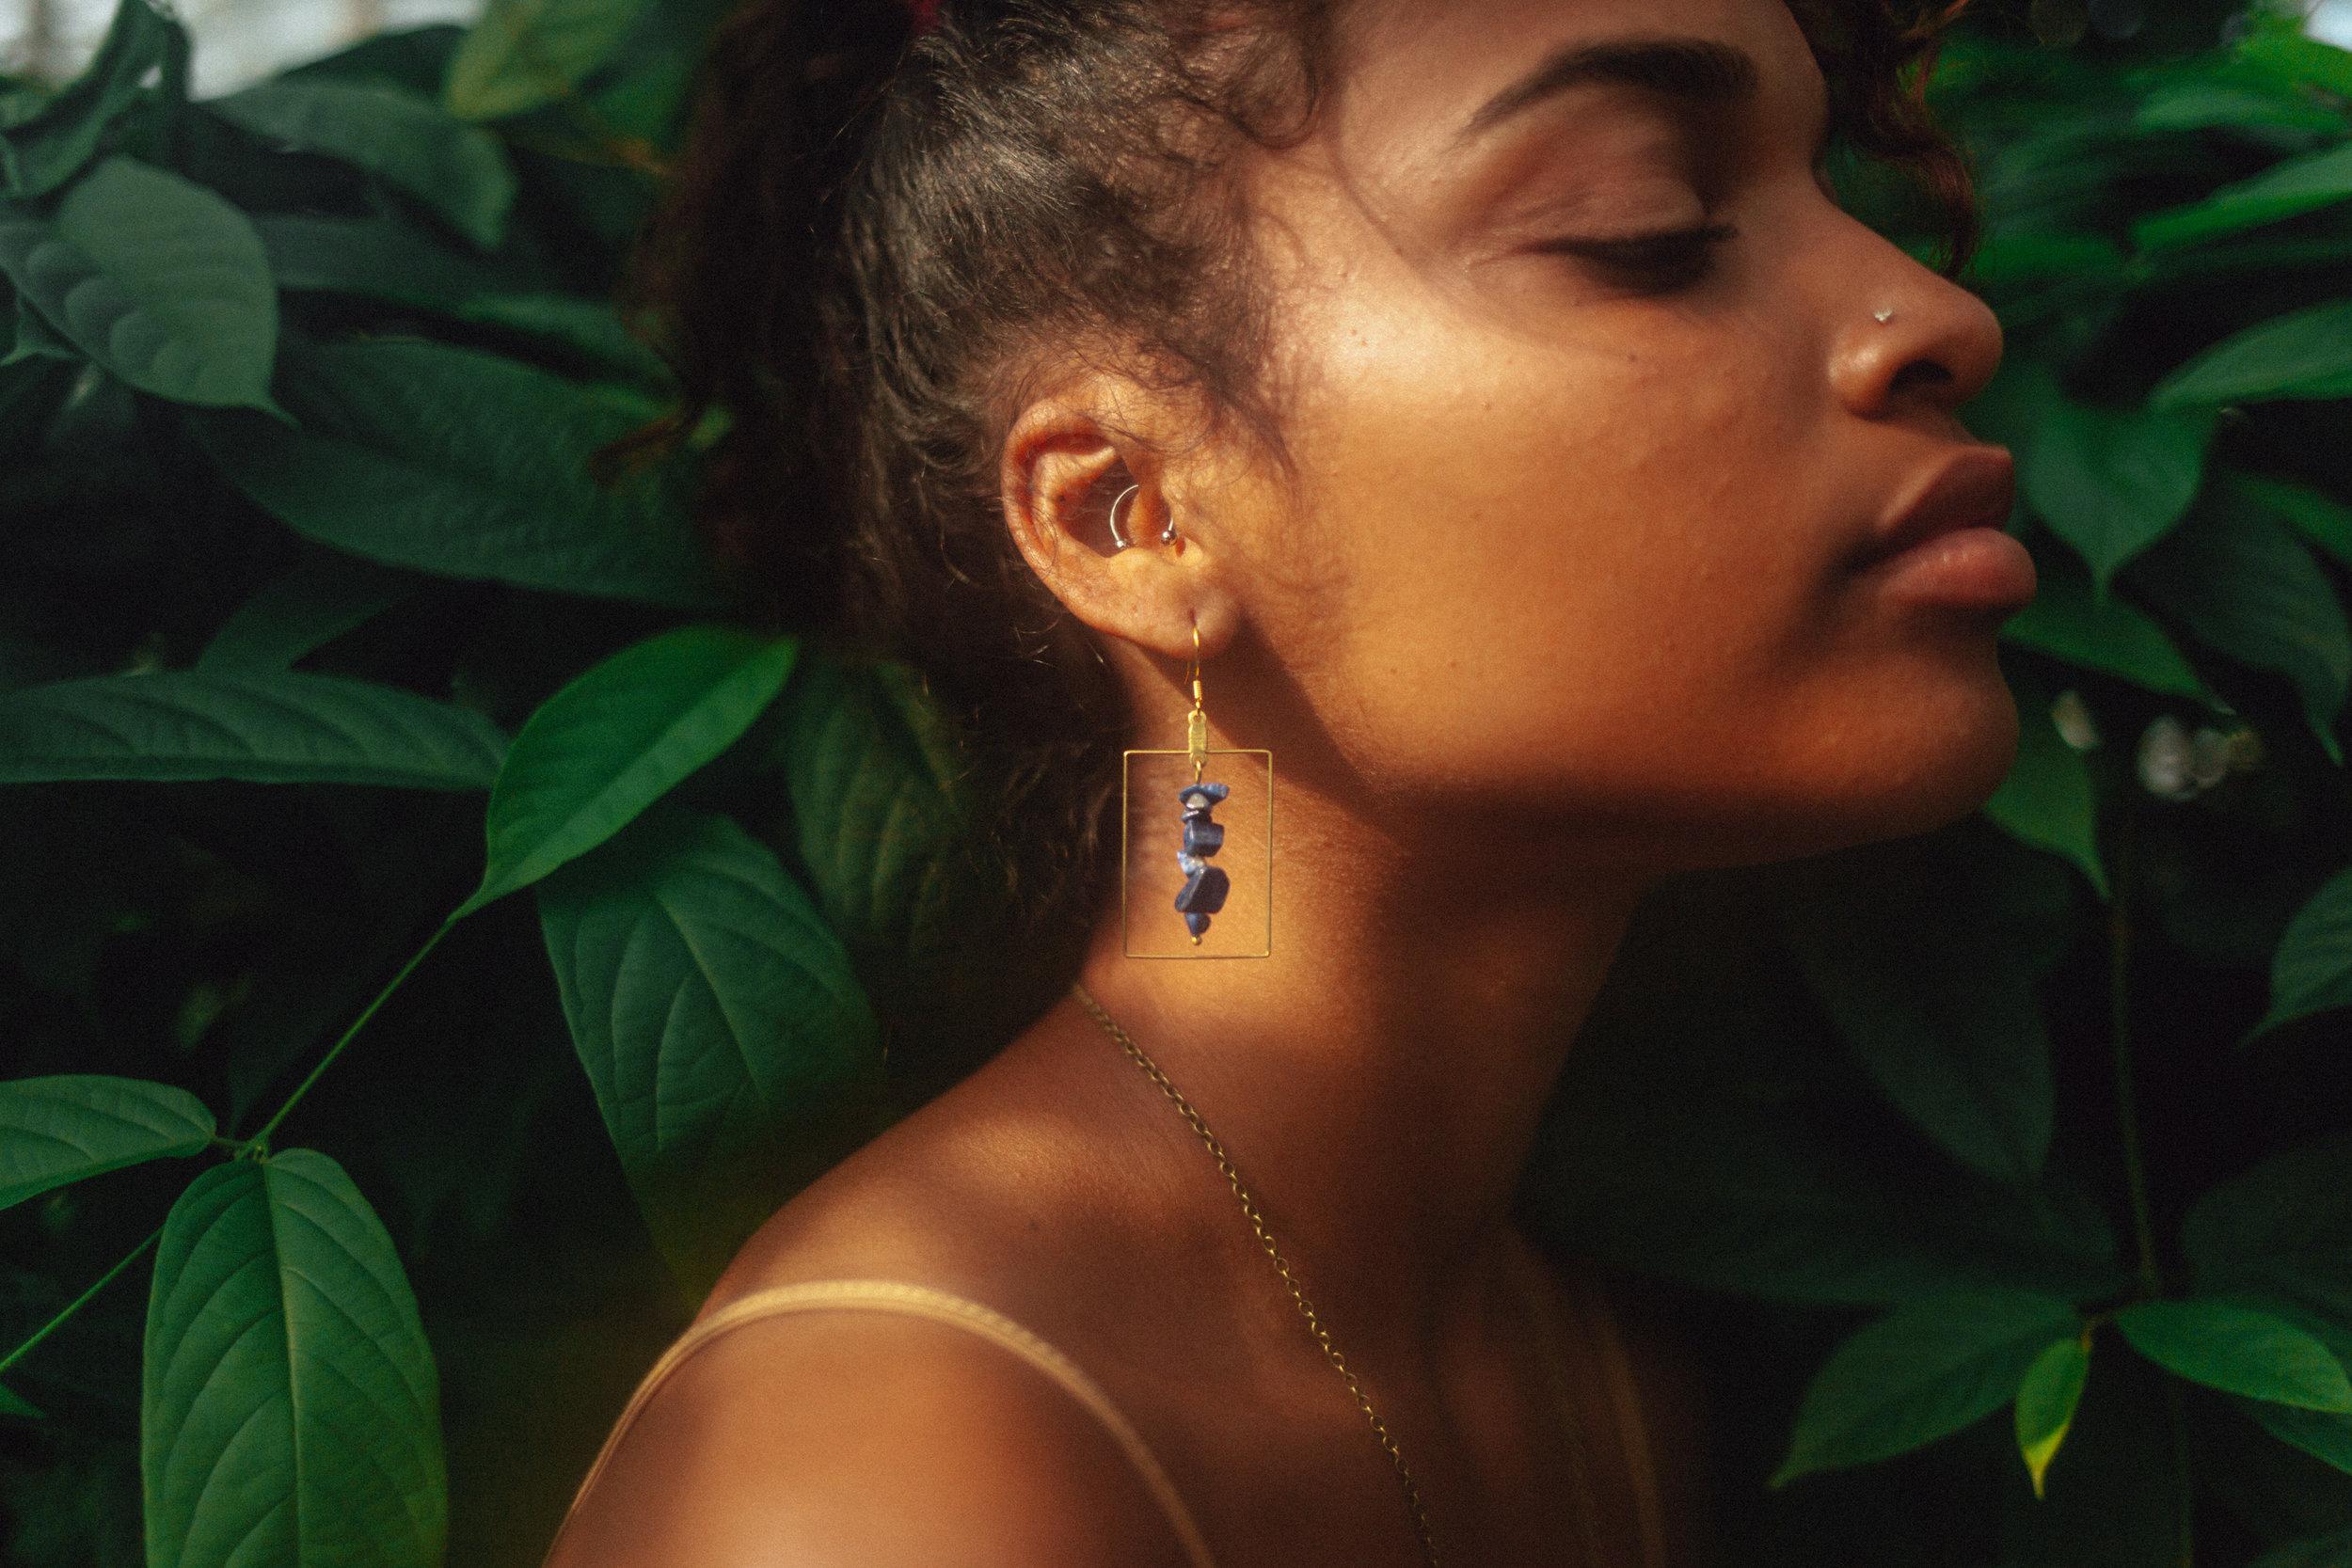 Lapis Lazuli Stone Hoop Earrings - Mineral Jewelry